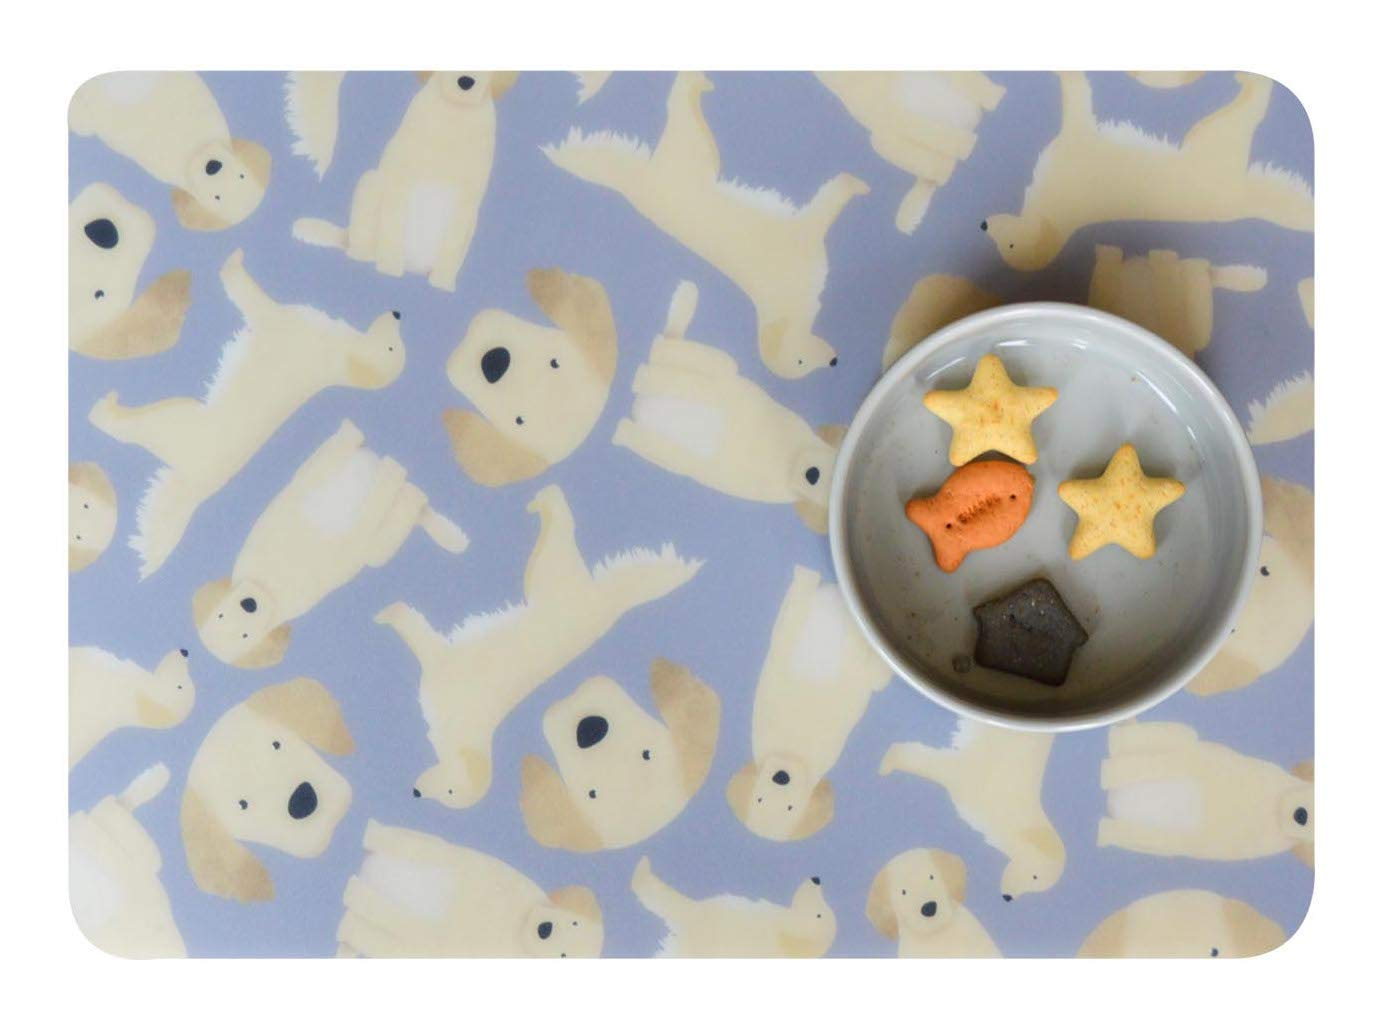 Poppy /& Duke Pet Placemat//Feeding bowls Mat Large A3 Dog Cat Retriever Grey B//G